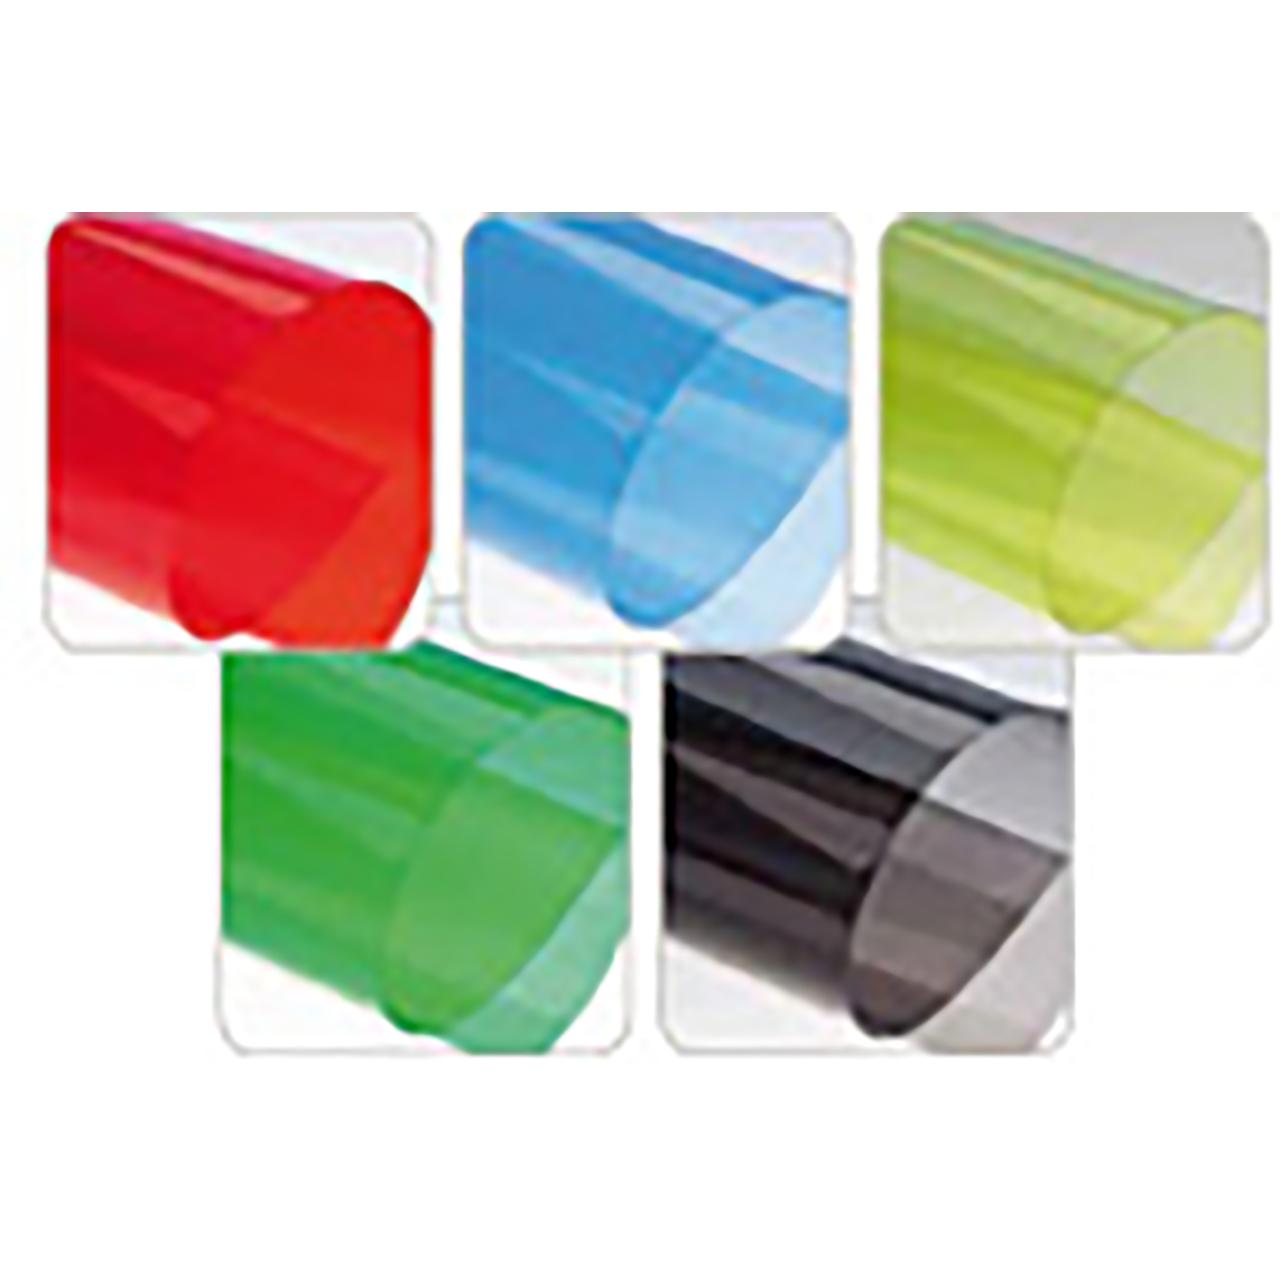 Renz Deckblaetter transparent